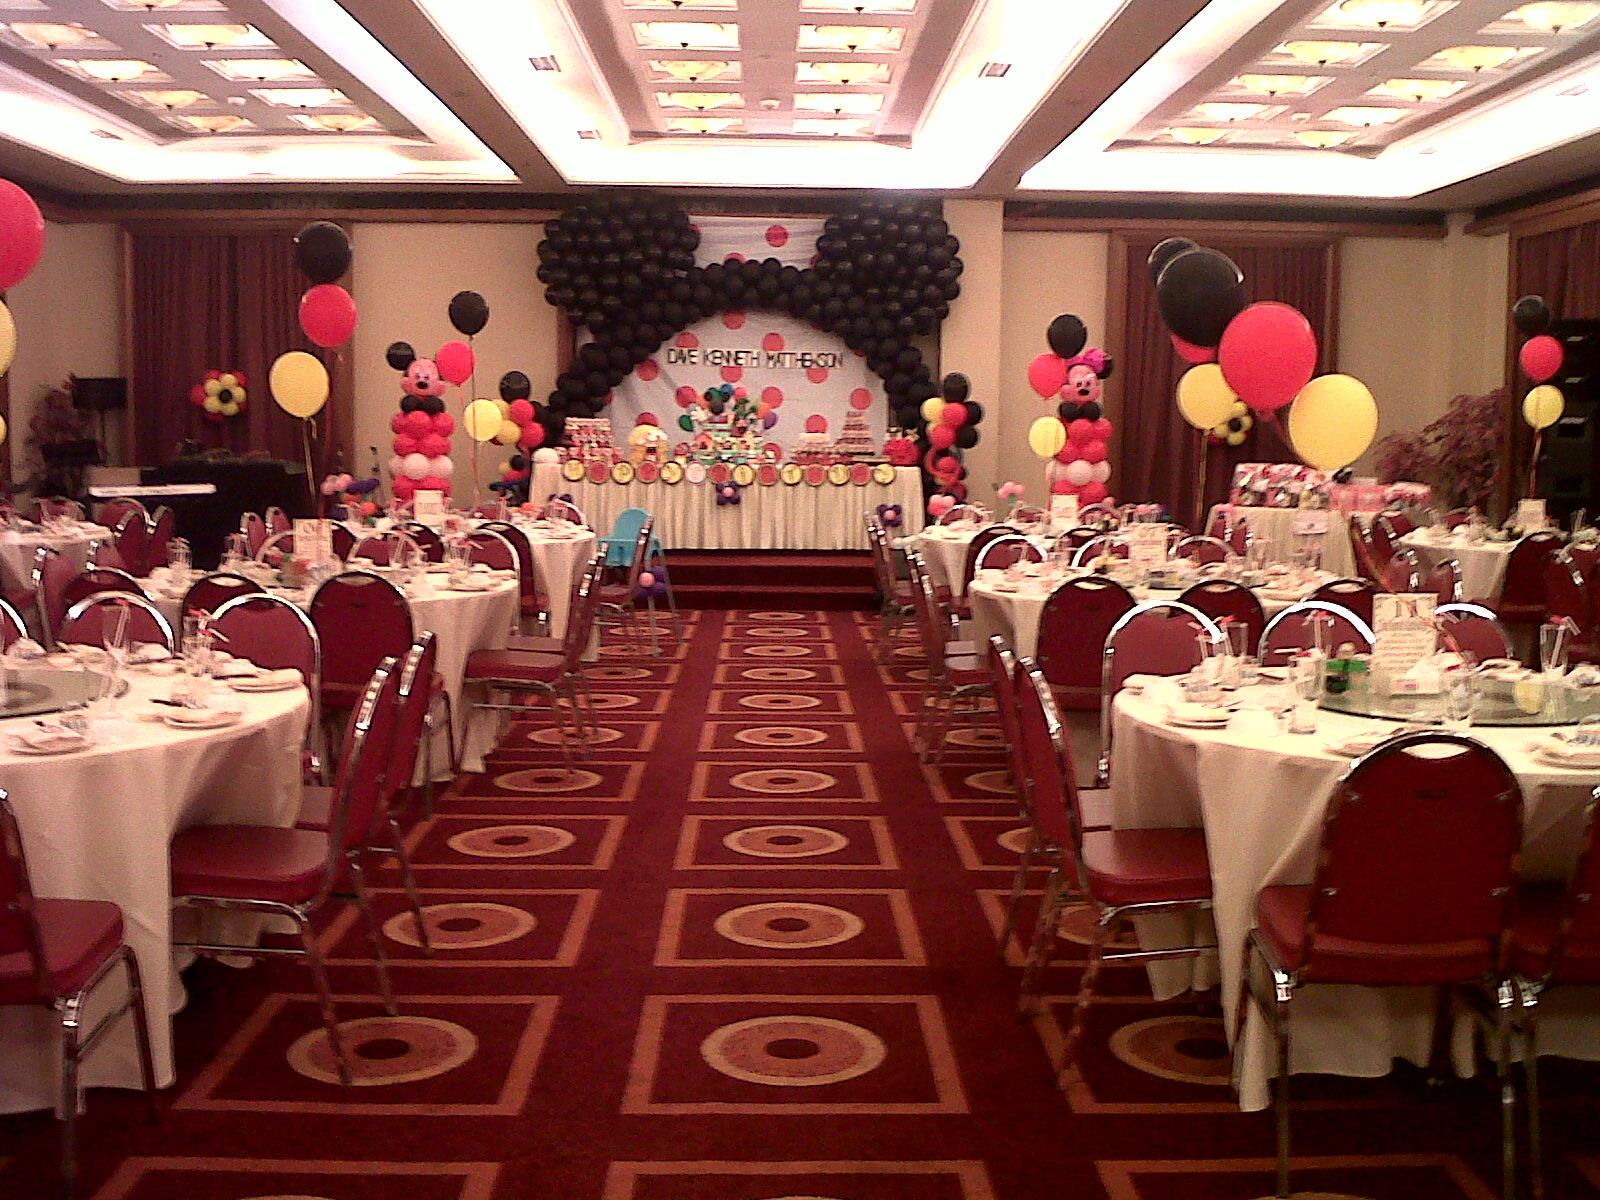 Dekorasi balon dekorasi birthday dave for Dekor ulang tahun